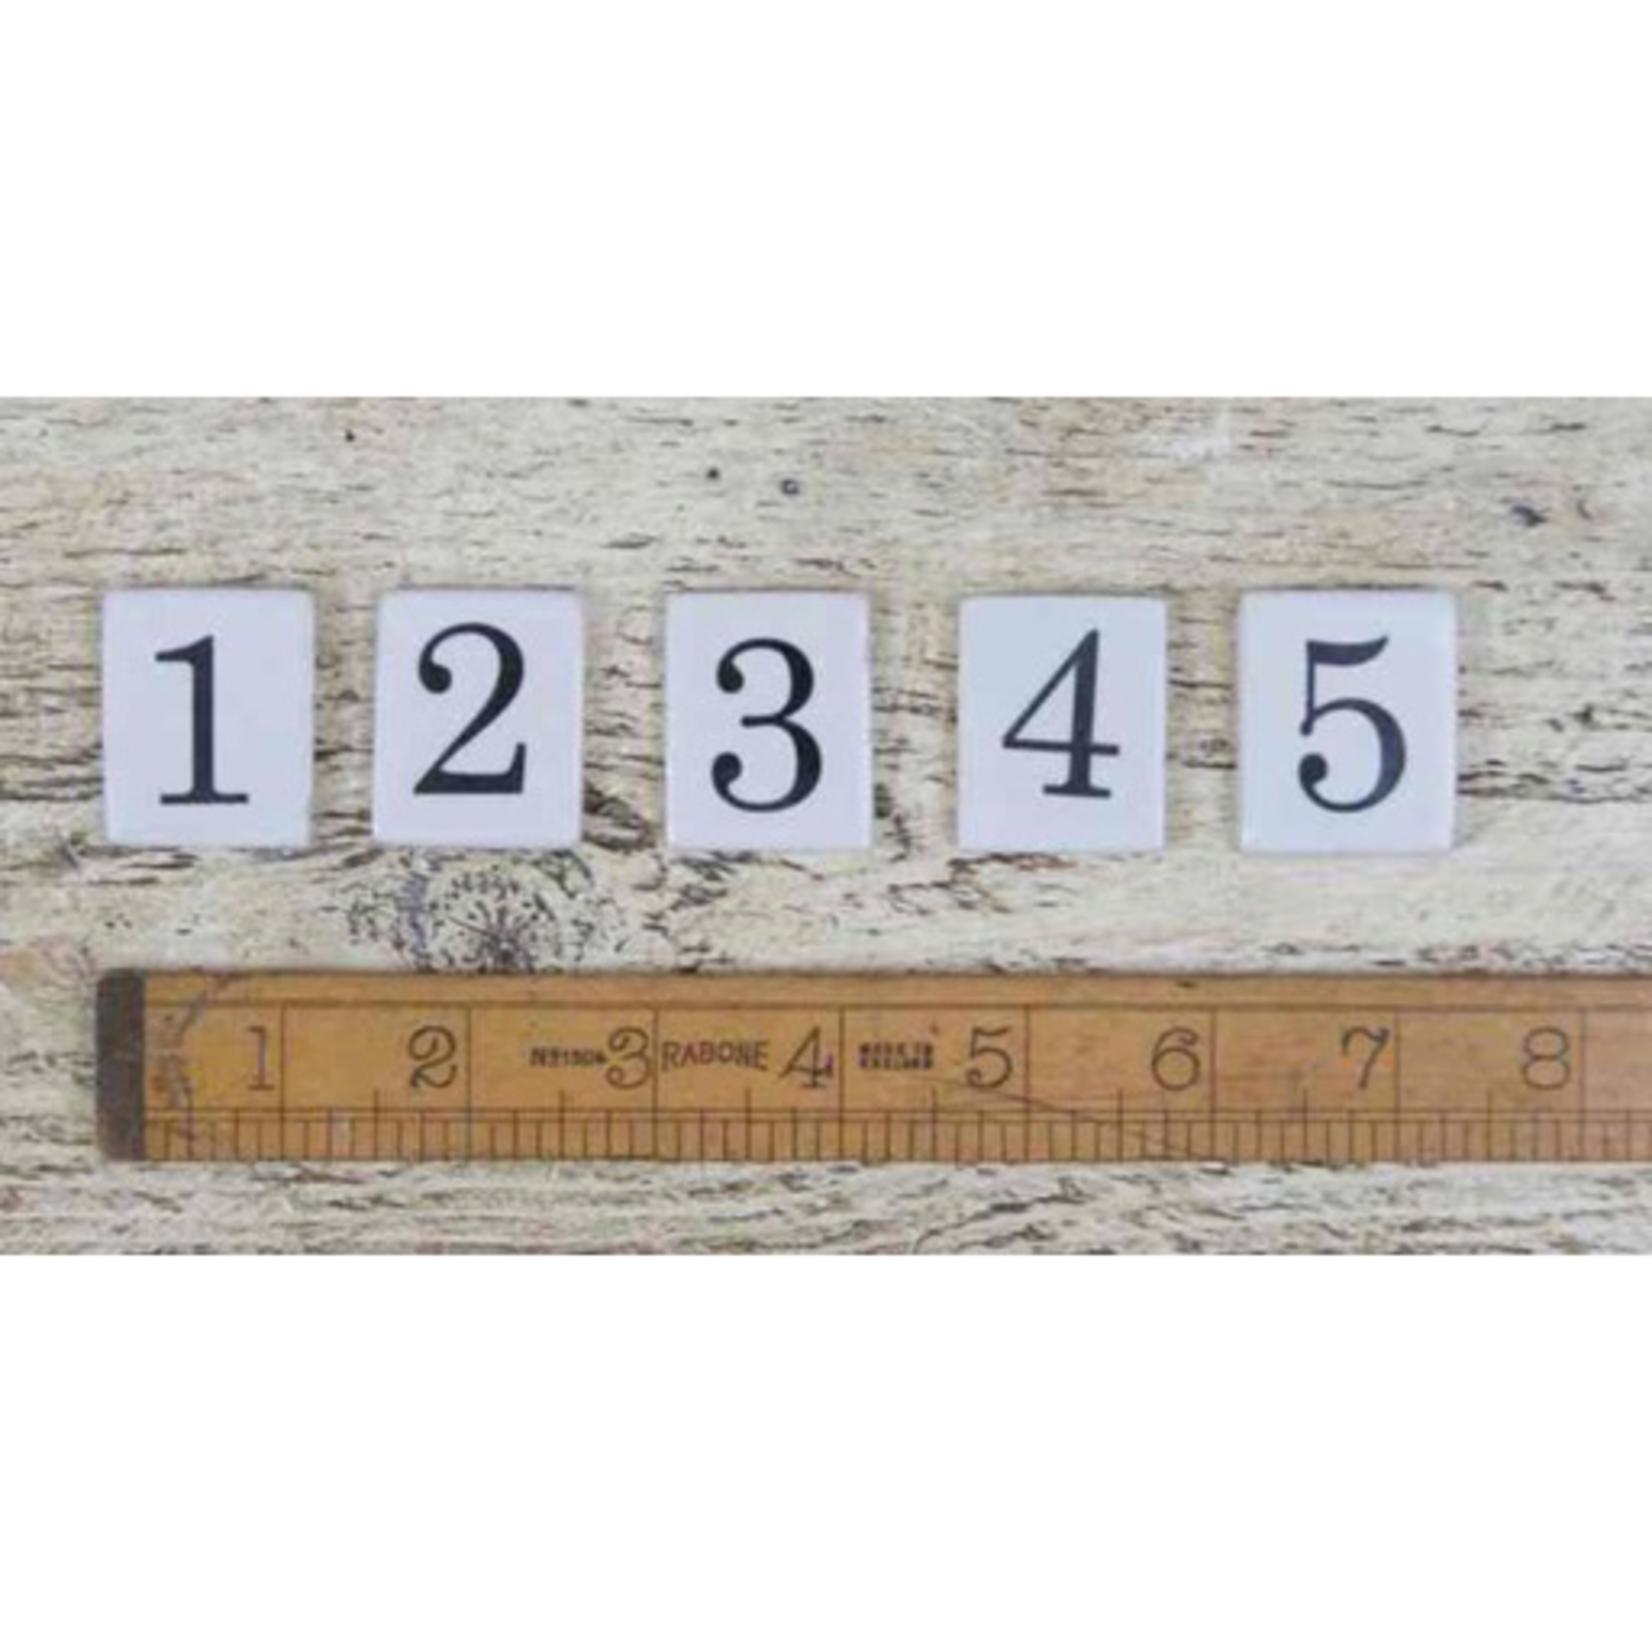 IRON RANGE Ceramic Inserts For Label Frame Coat Hook Off-White NO 2